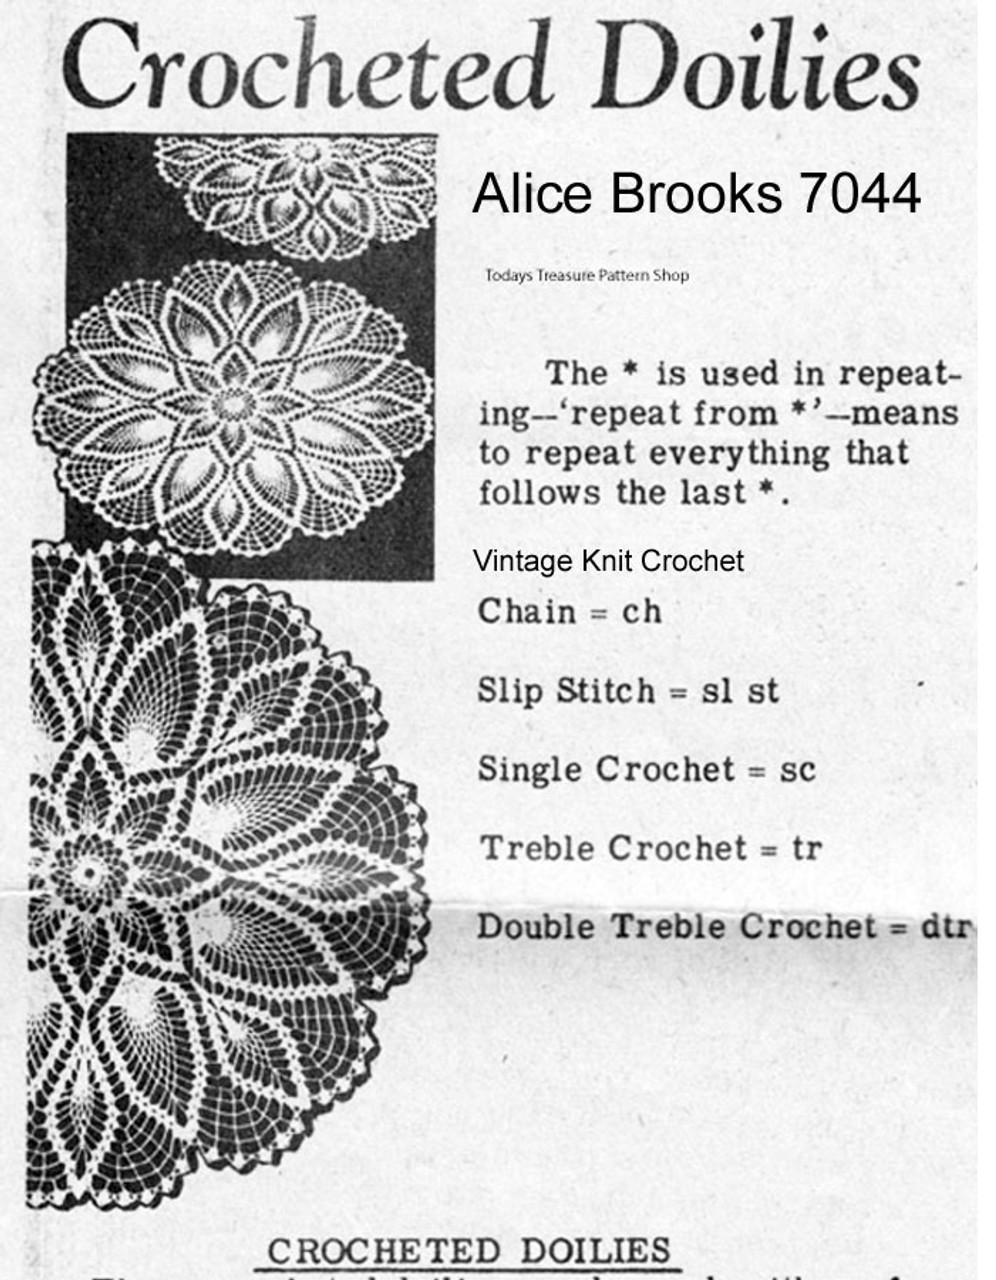 Vintage Crochet Pineapple Doily Pattern, Alice Brooks 7044